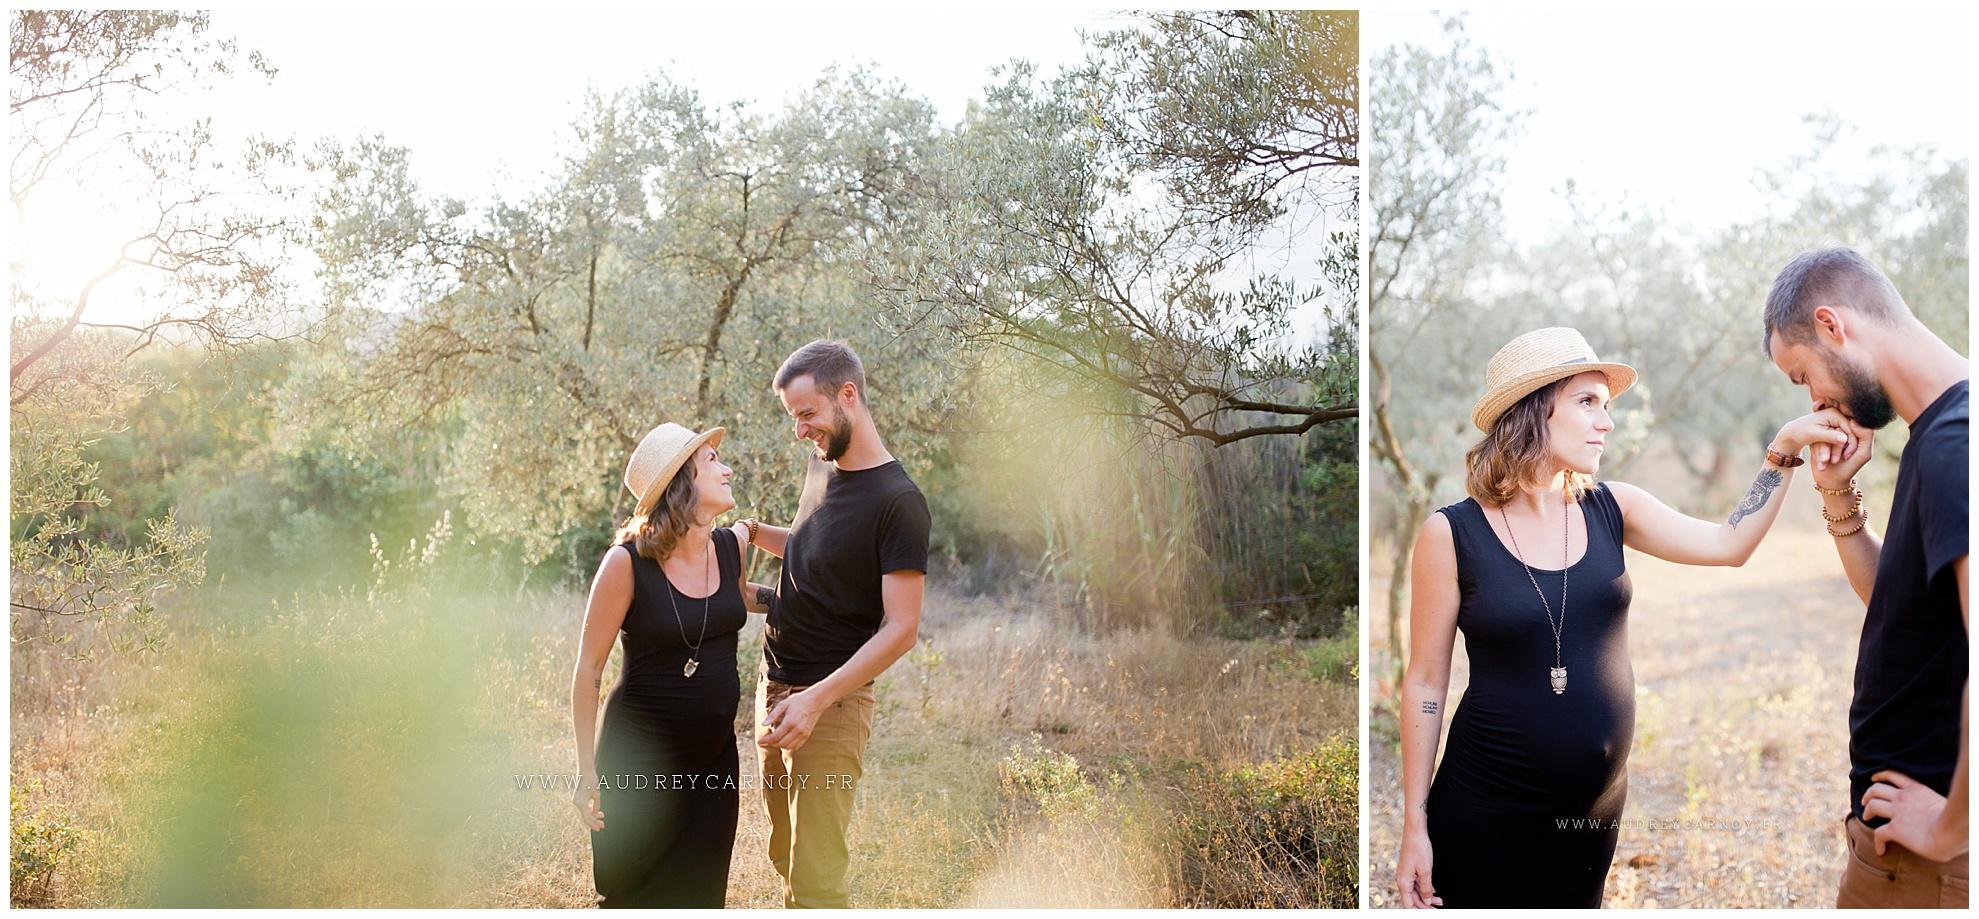 Seance grossesse Provence - Pertuis | Audrey & Jerome 5